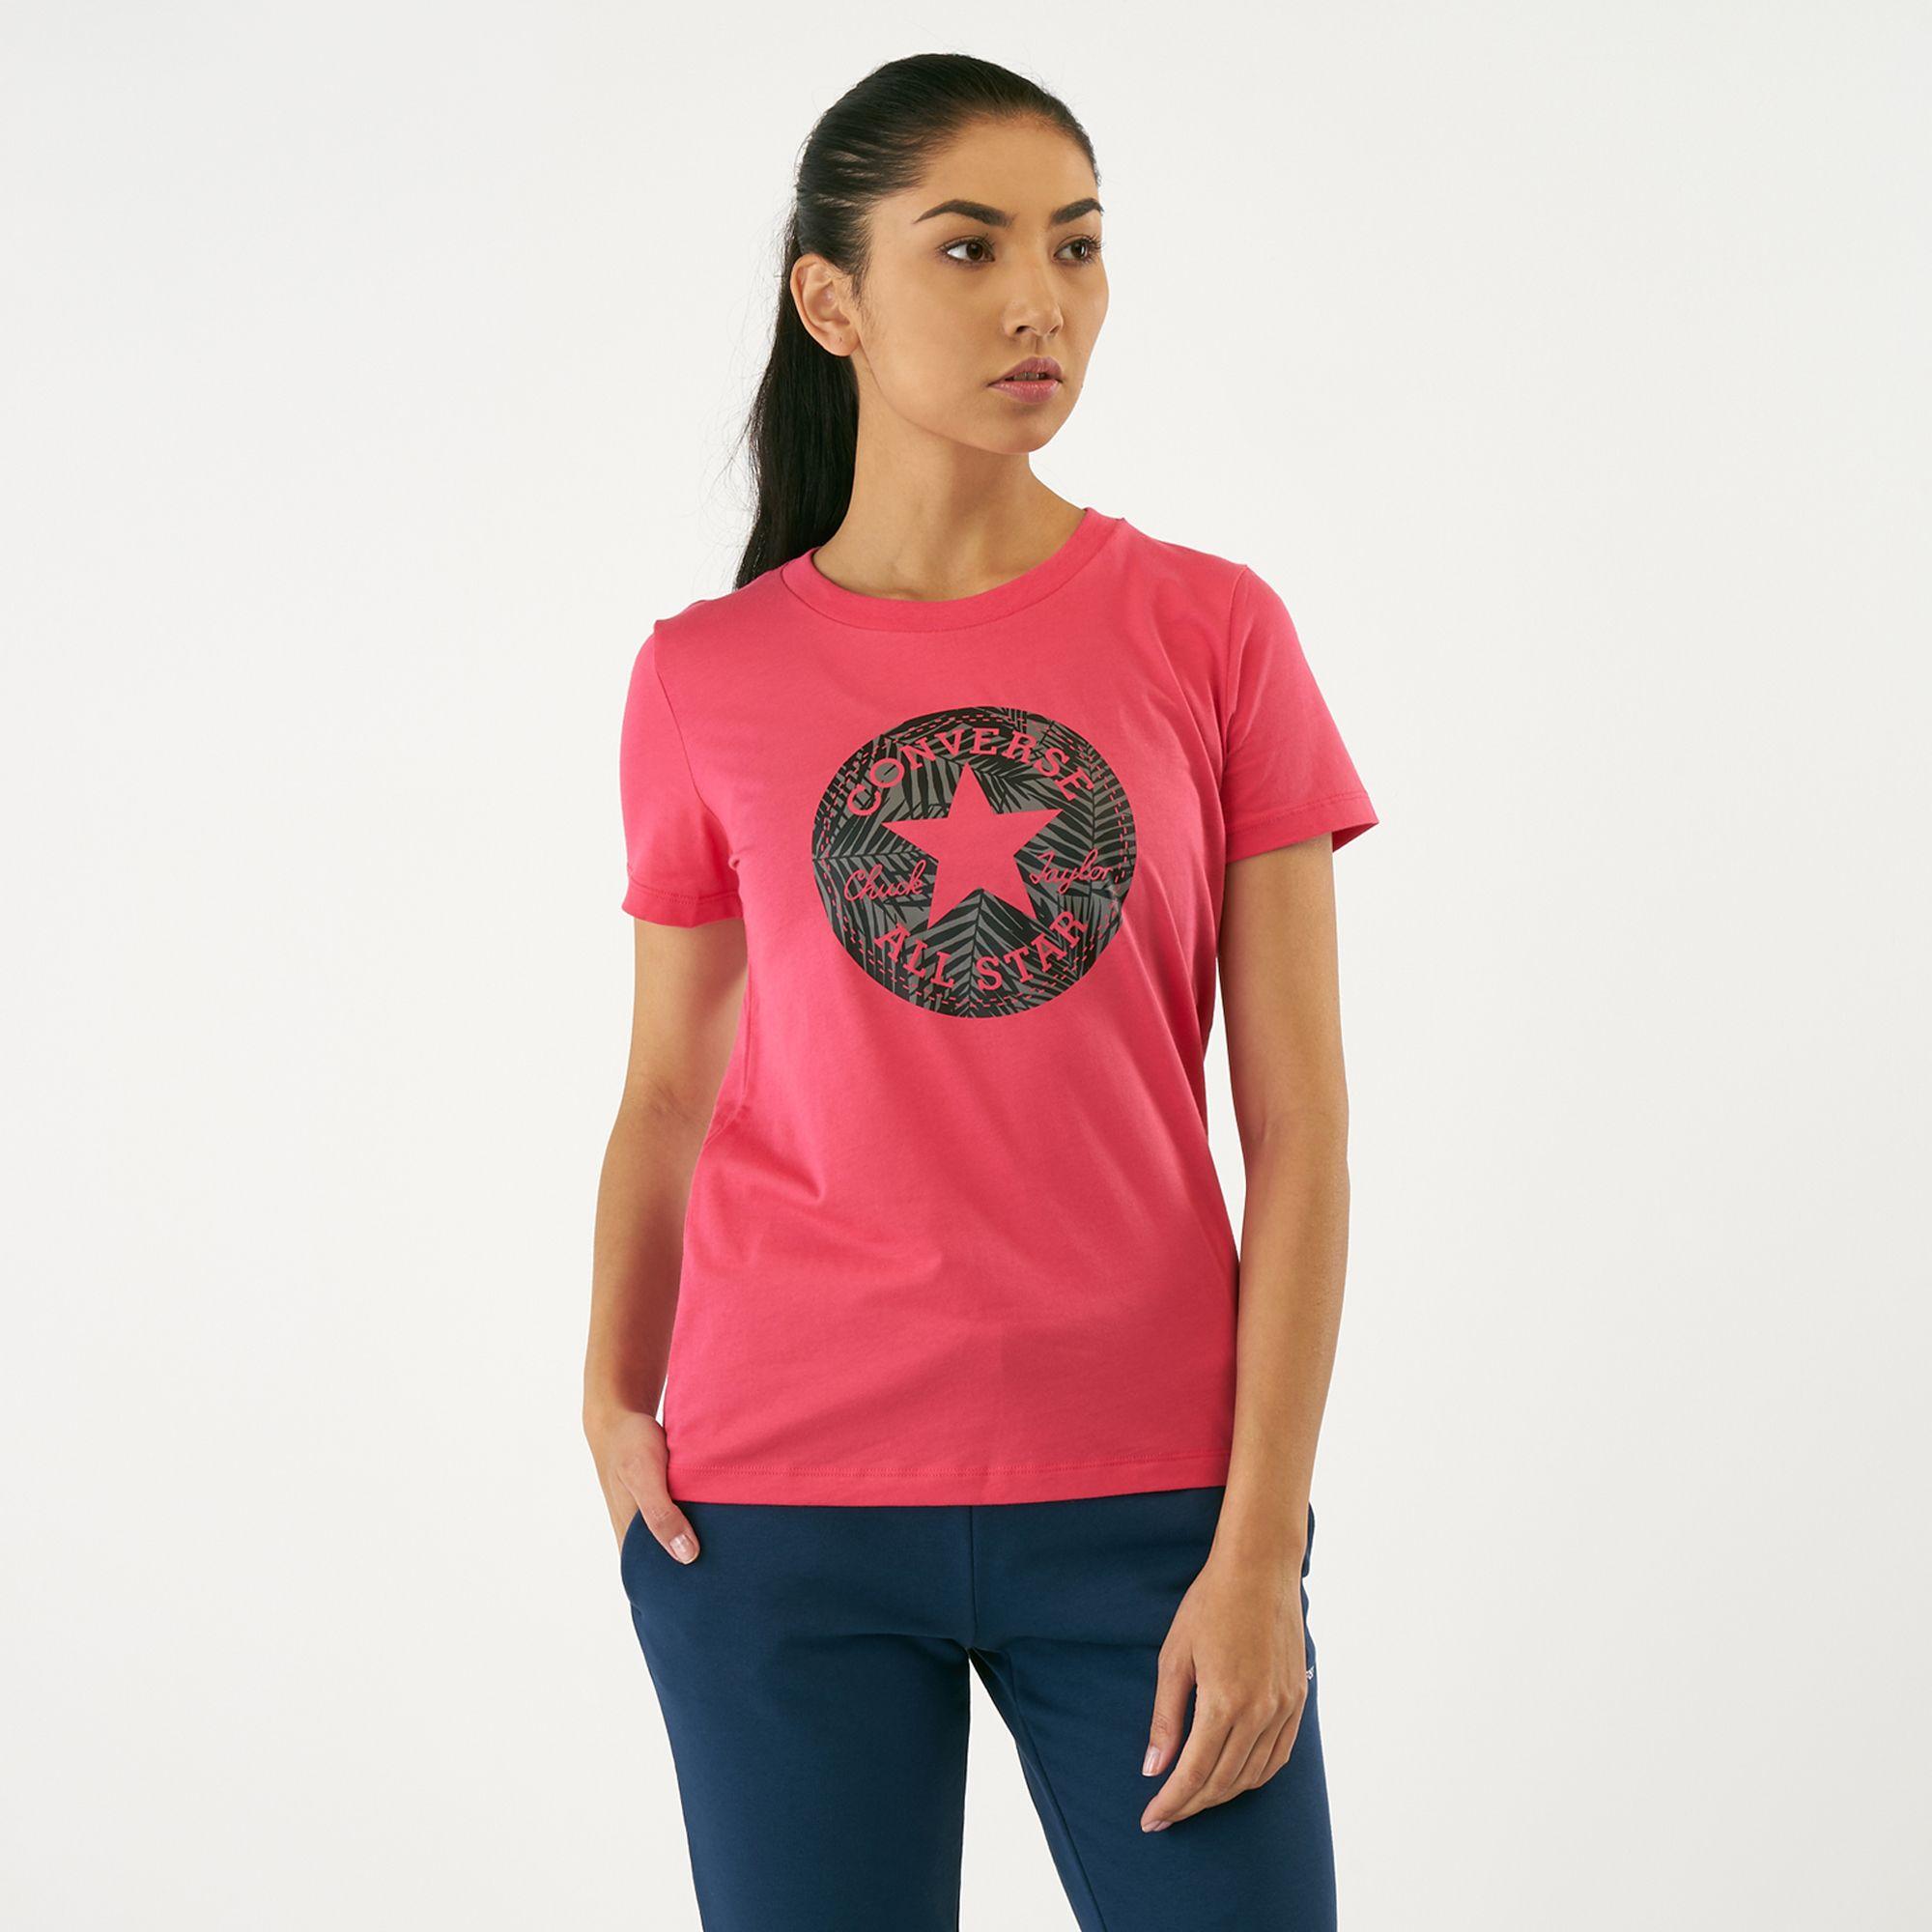 e13fbdbb1 Converse Women's Chuck Taylor Palm Patch T-Shirt | T-Shirts | Tops ...